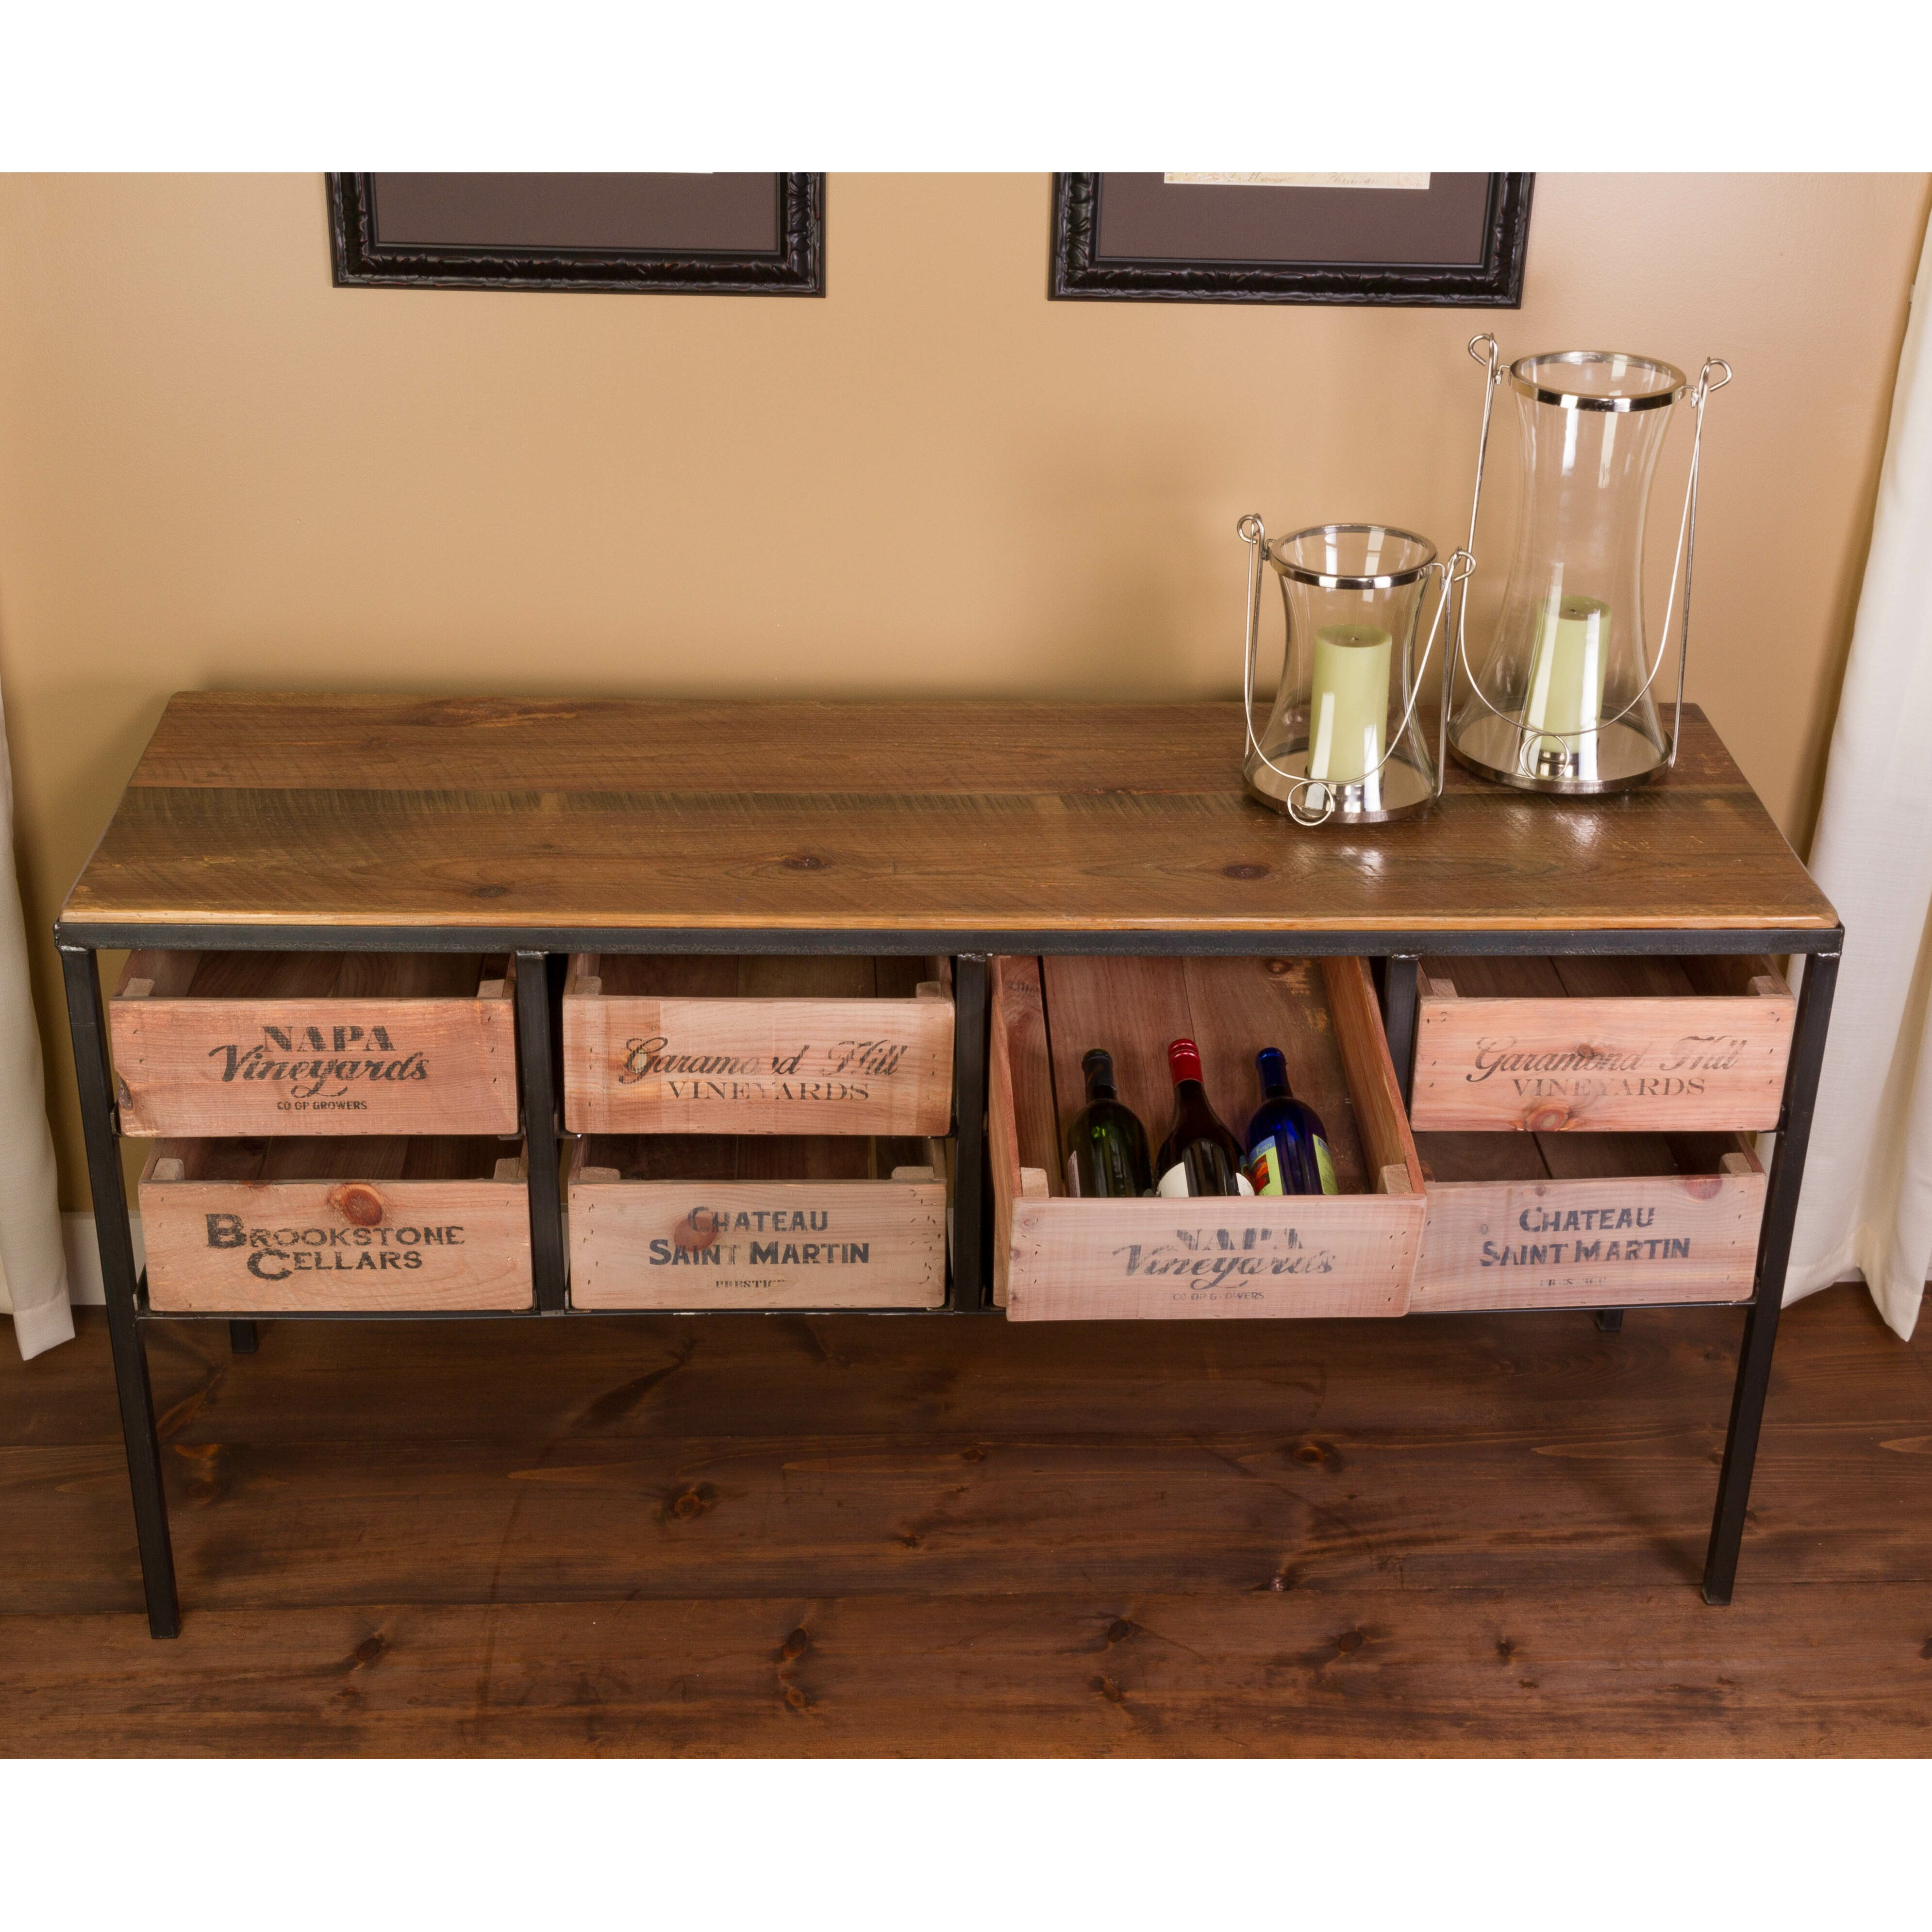 Vino vintage console table reviews wayfair Retro sofa table